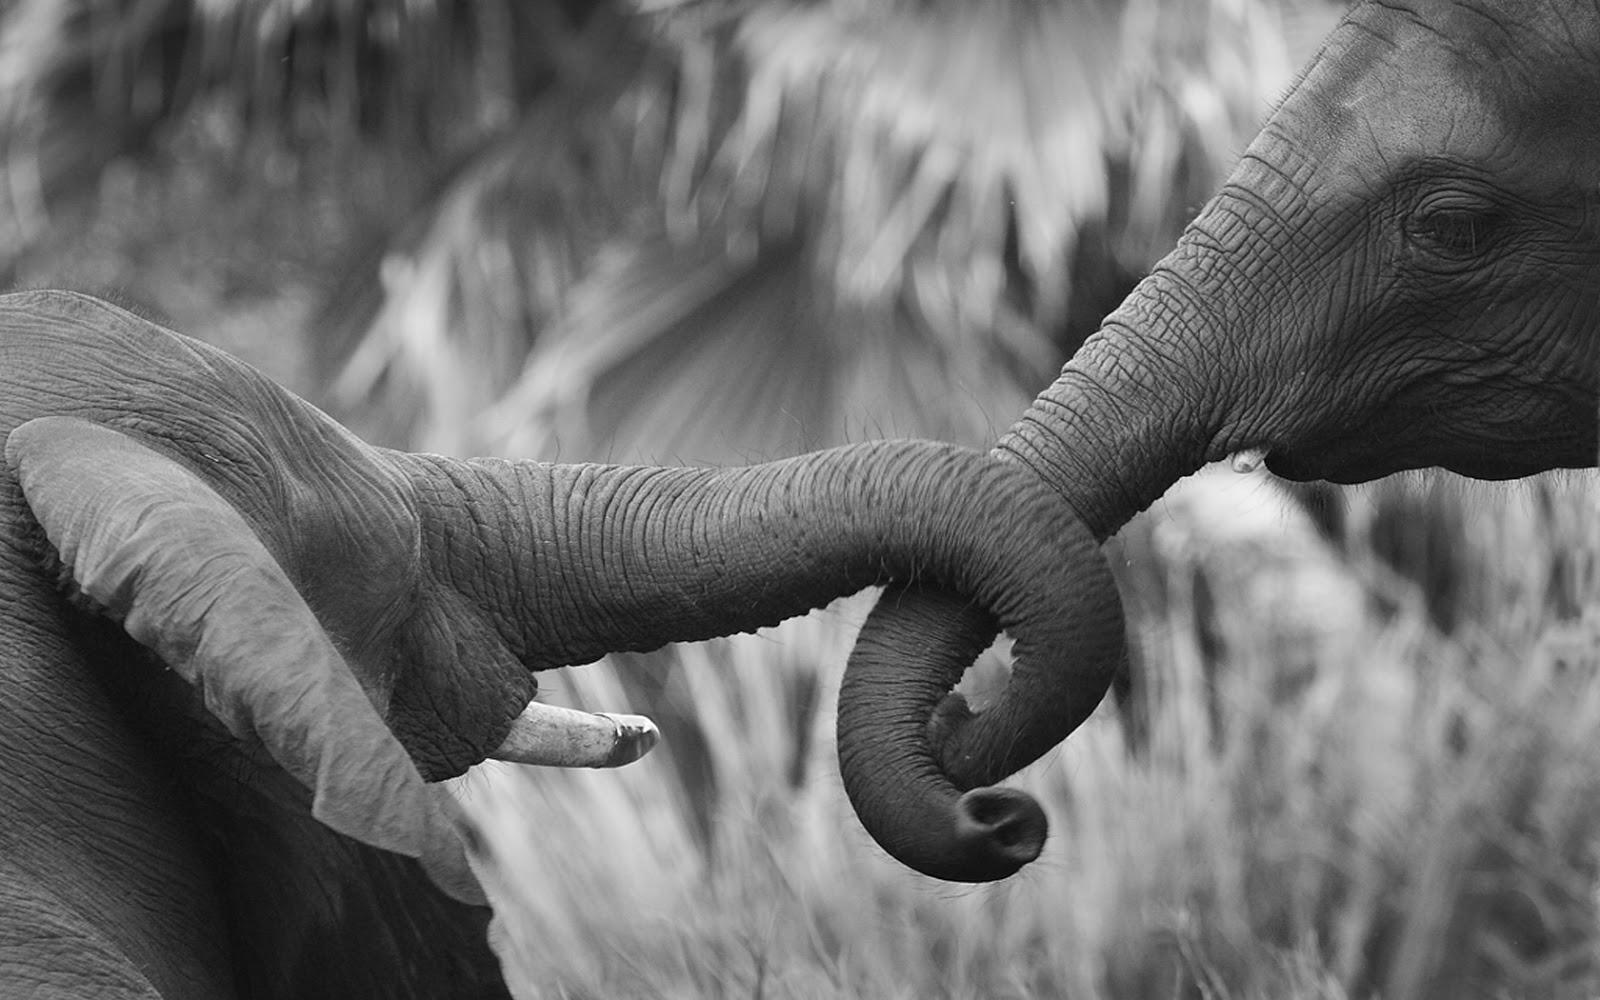 20 Amazing Elephants Wallpapers HD - Tapandaola111